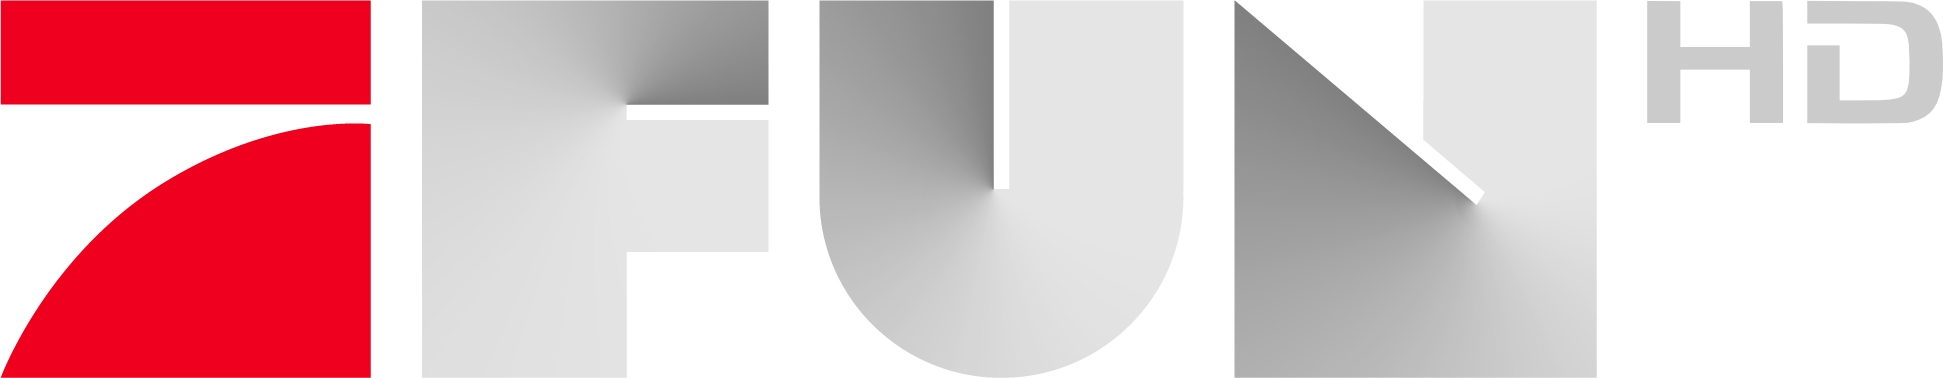 Datei:ProSieben Fun HD 2012.png – Wikipedia